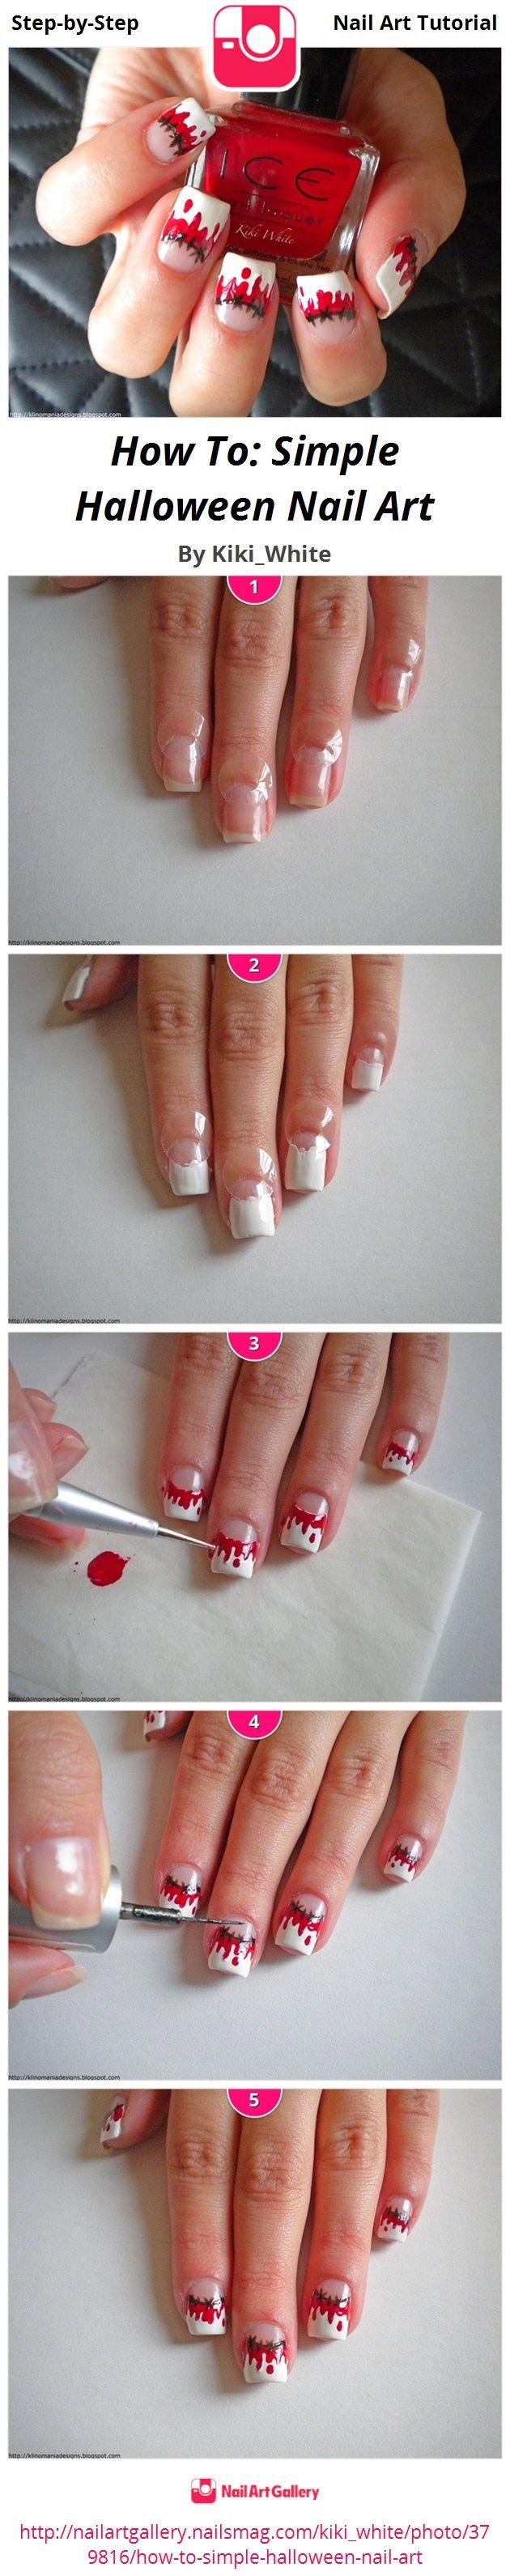 How To: Simple Halloween Nail Art by Kiki_White - Nail Art Gallery Step-by-Step Tutorials nailartgallery.nailsmag.com by Nails Magazine www.nailsmag.com #nailart